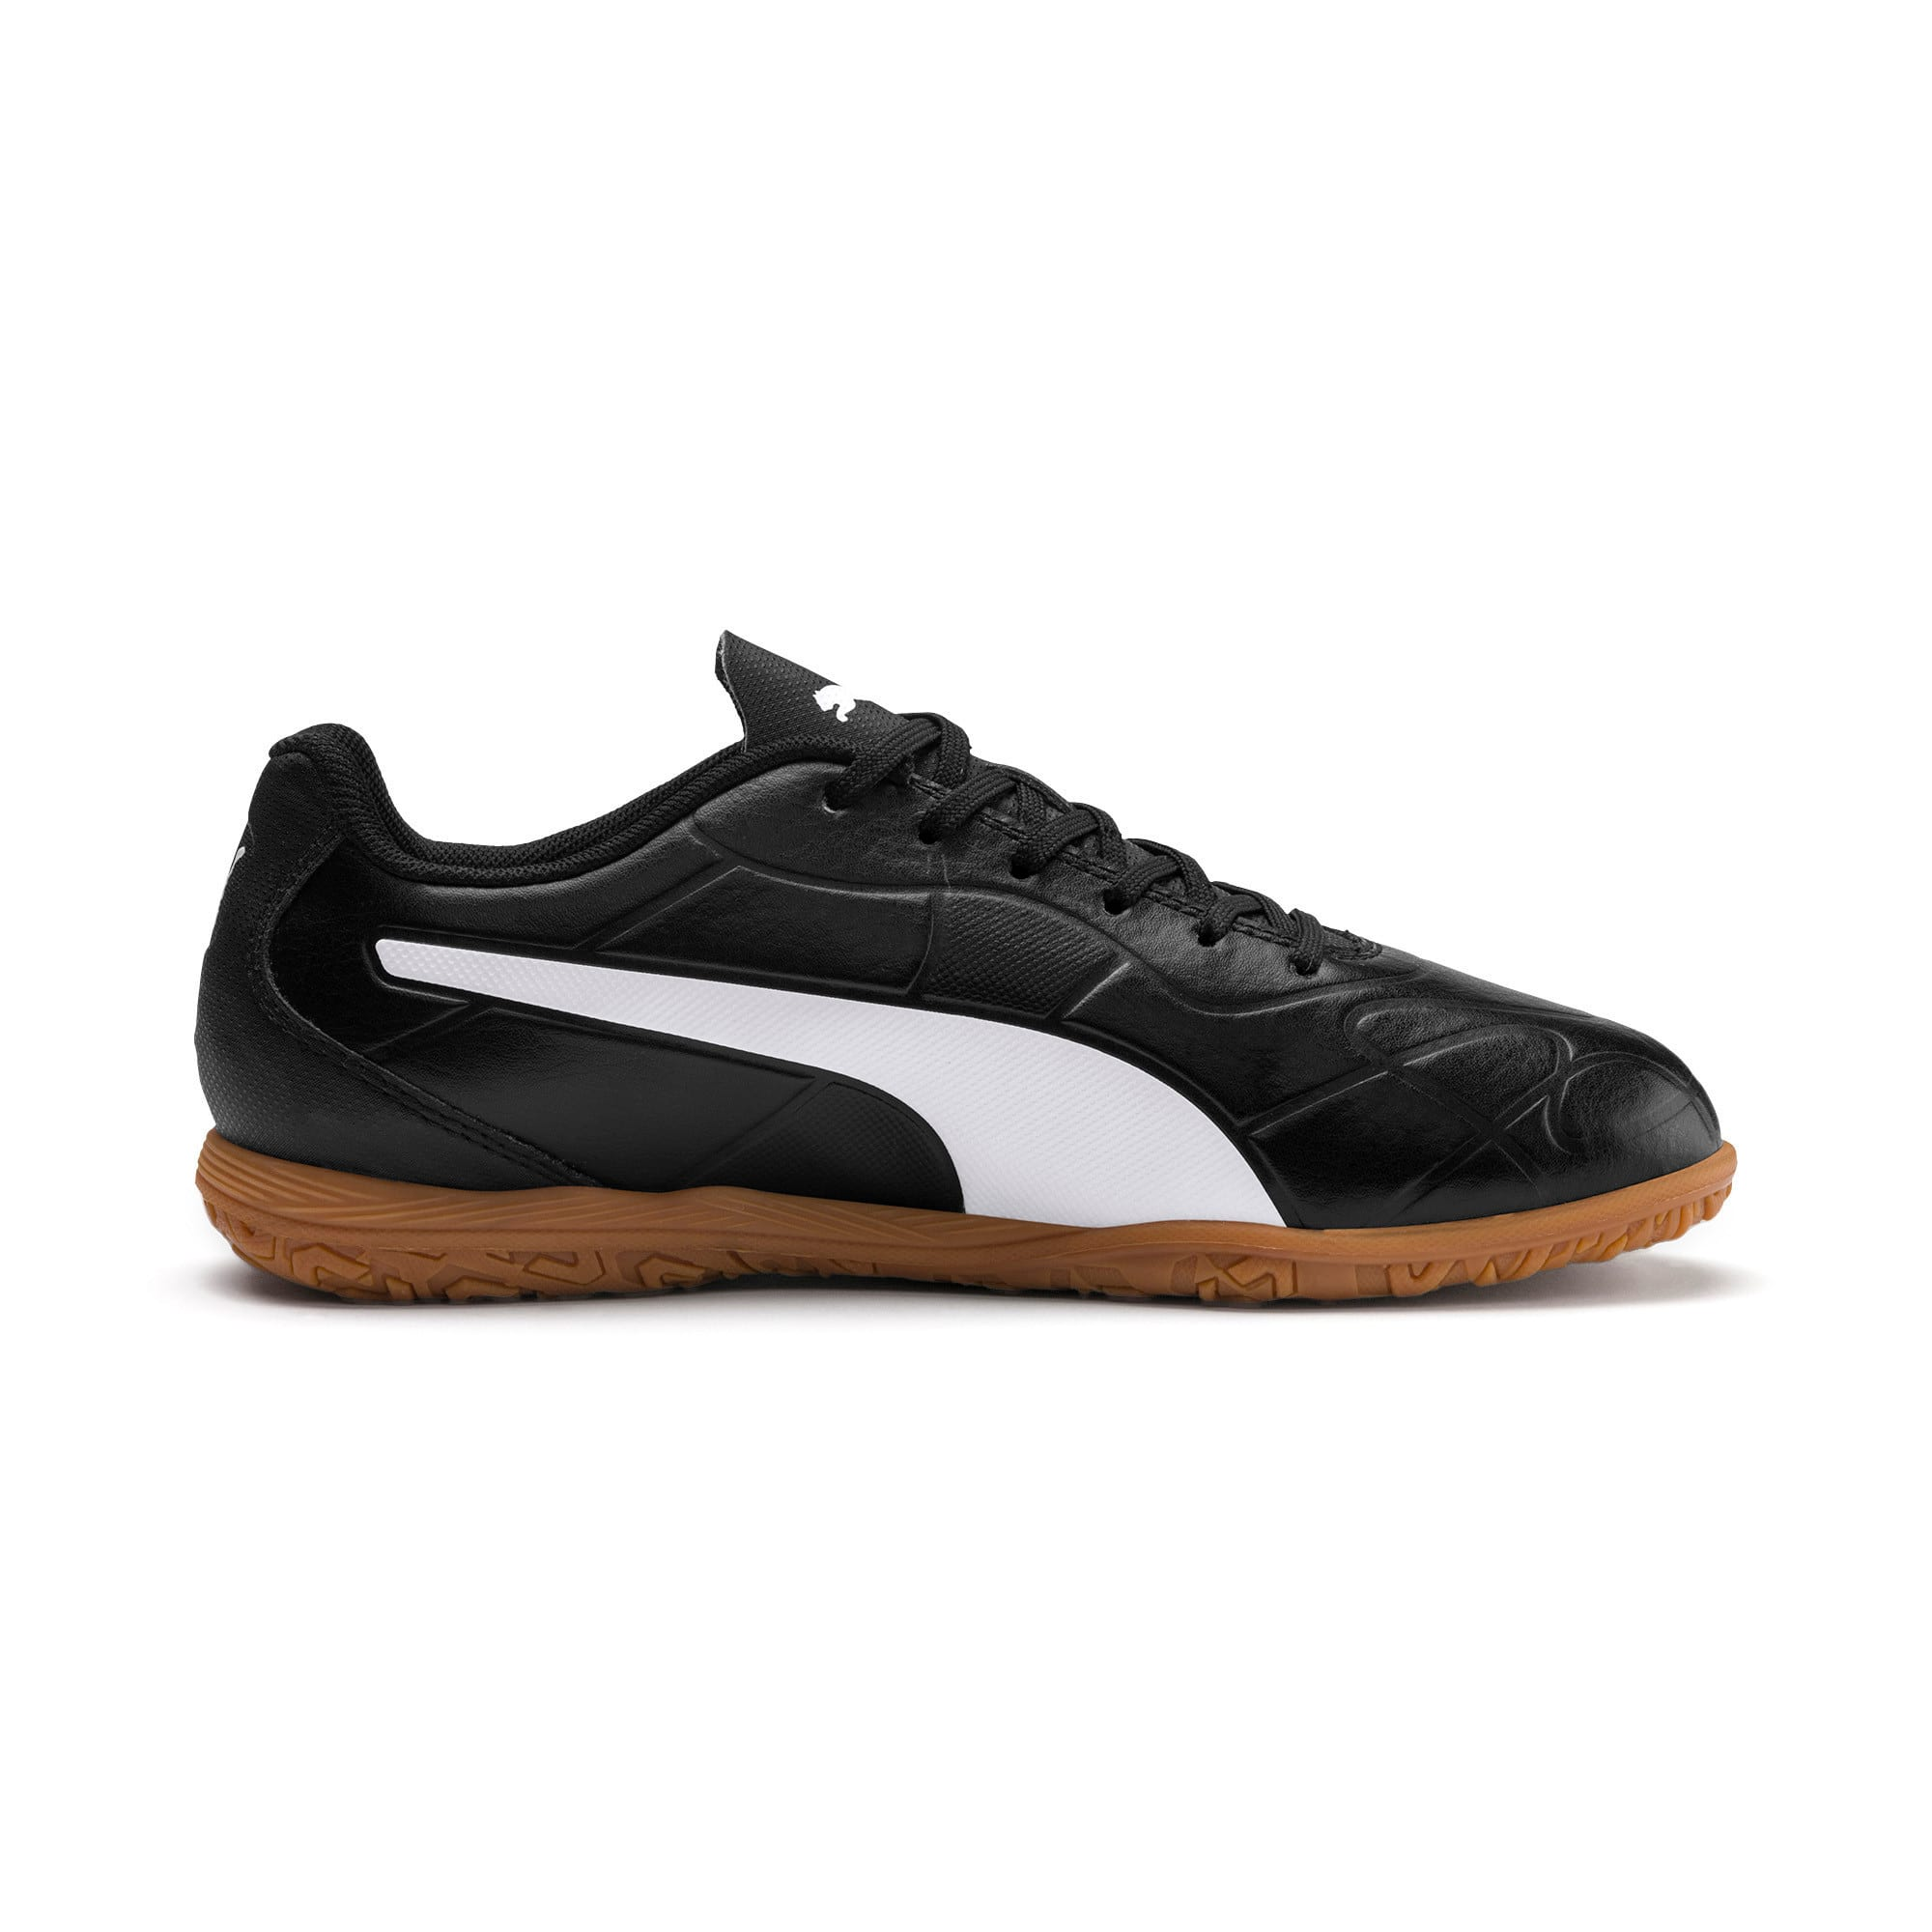 Thumbnail 3 of Monarch IT Youth Football Boot, Puma Black-Puma White, medium-IND